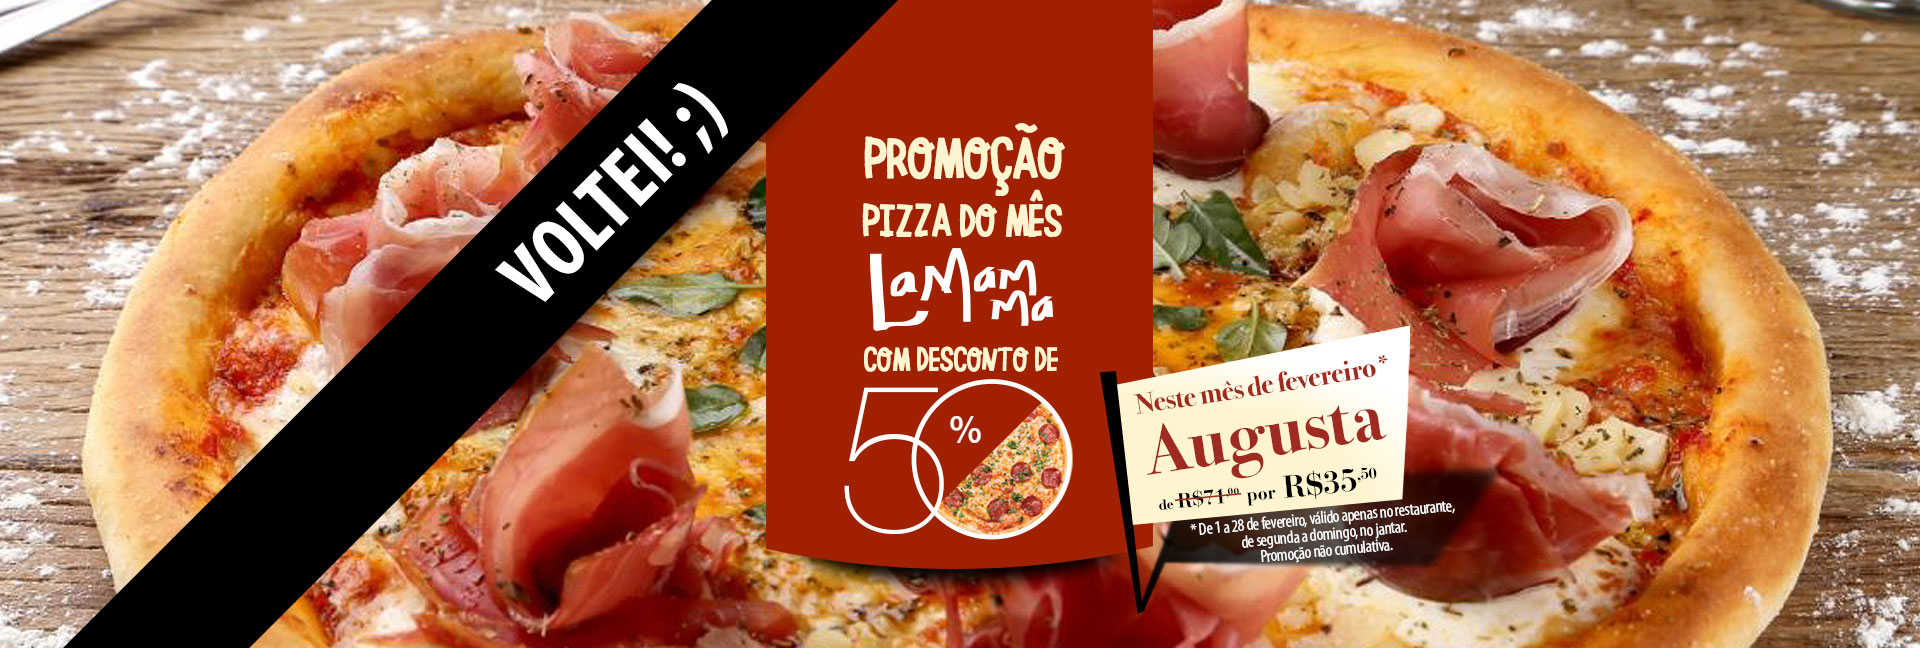 Pizza do Mês